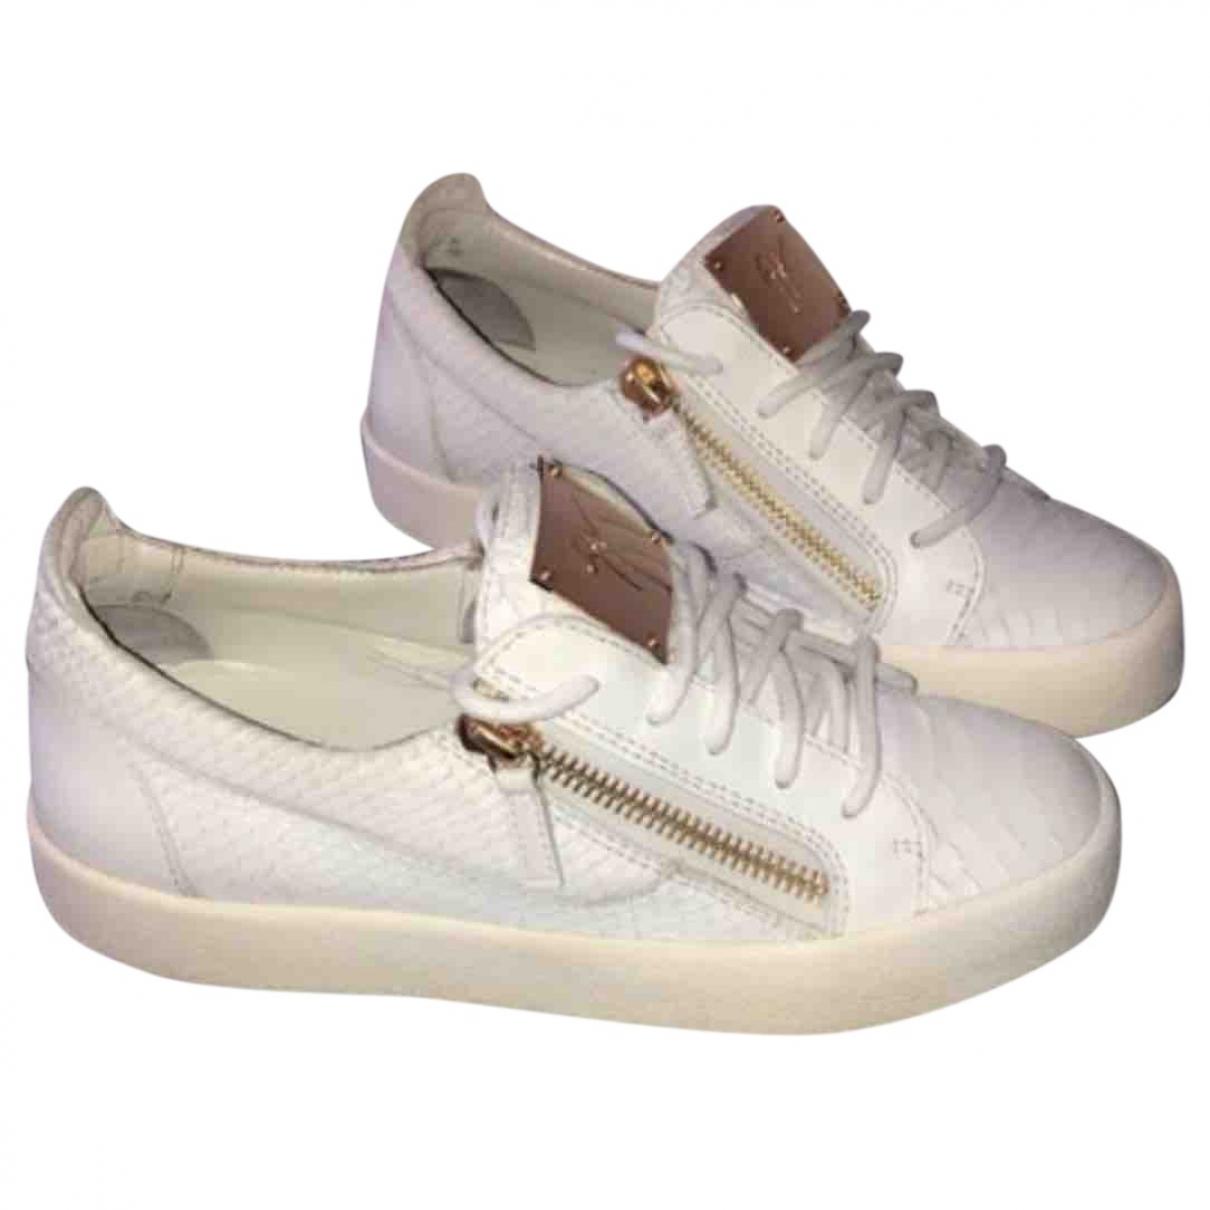 Giuseppe Zanotti - Baskets   pour femme en cuir - blanc